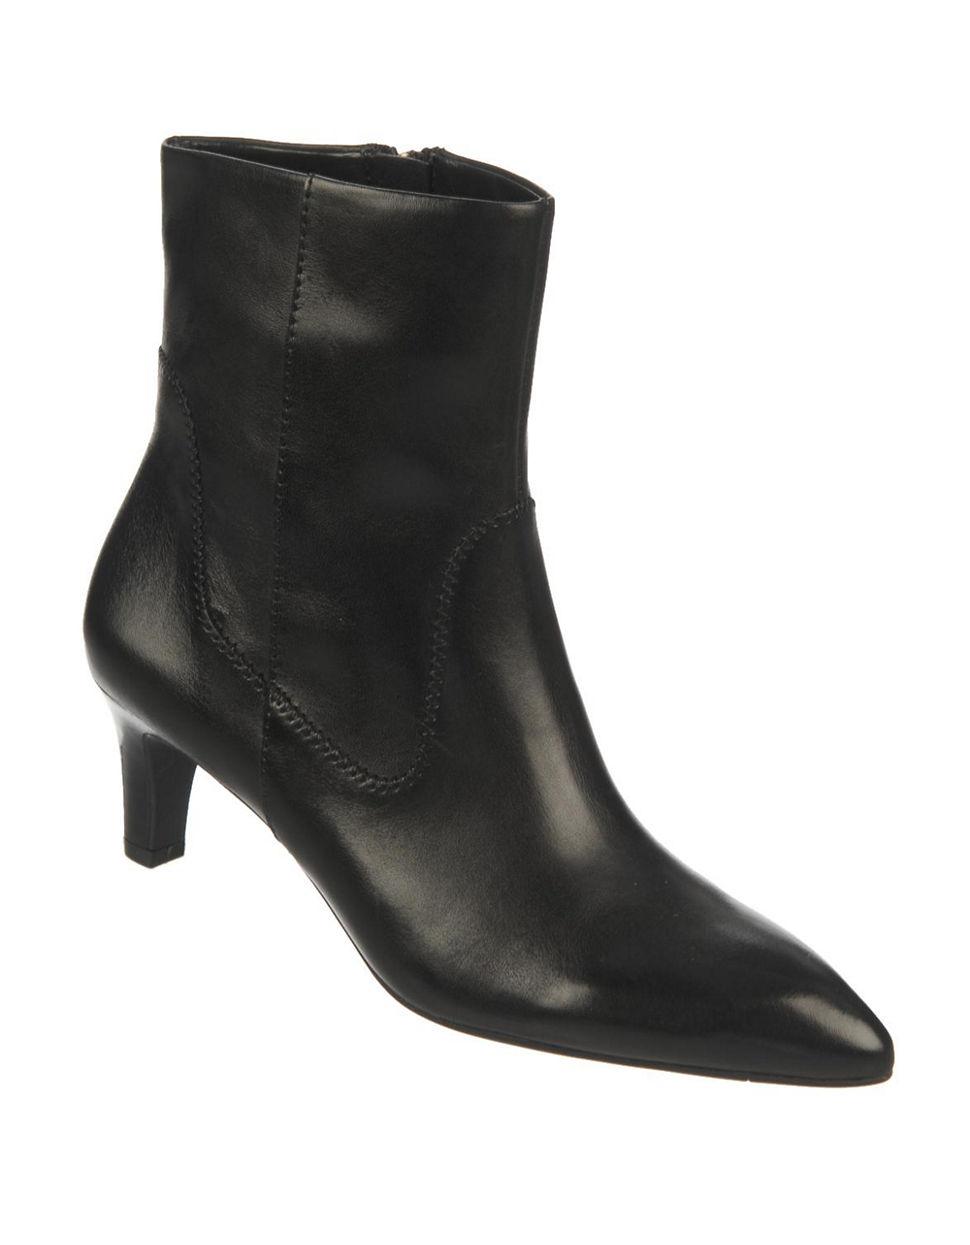 franco sarto regis leather boots in black lyst